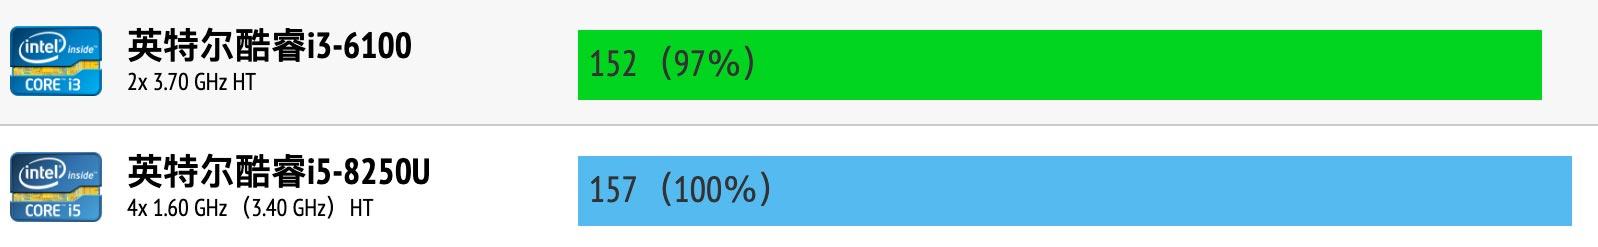 Intel Core i3-6100和i5-8250U性能跑分对比评测